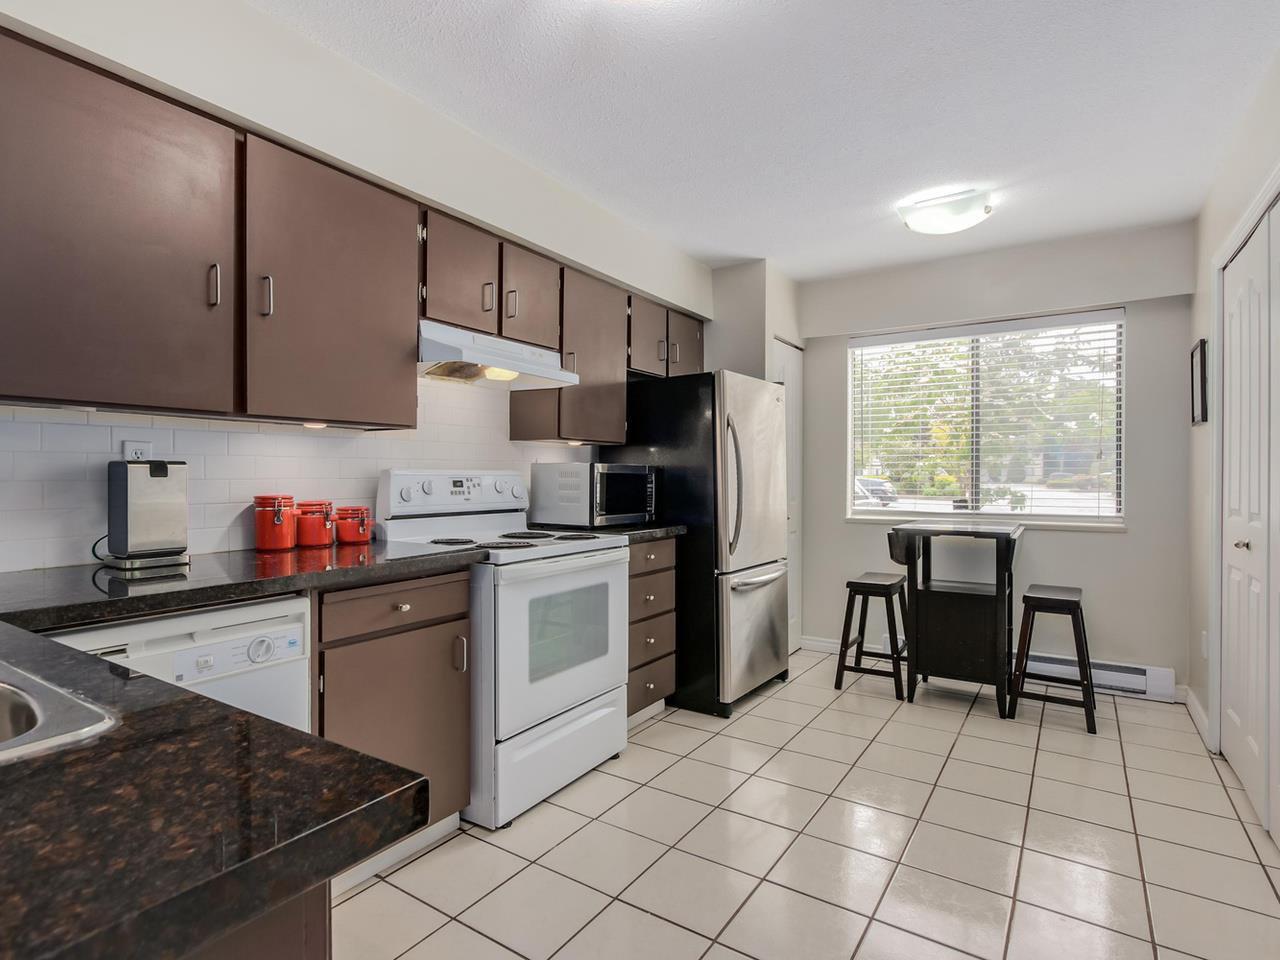 "Photo 8: Photos: 60 4800 TRIMARAN Drive in Richmond: Steveston South Townhouse for sale in ""BIRCHWOOD ESTATES"" : MLS®# R2069692"